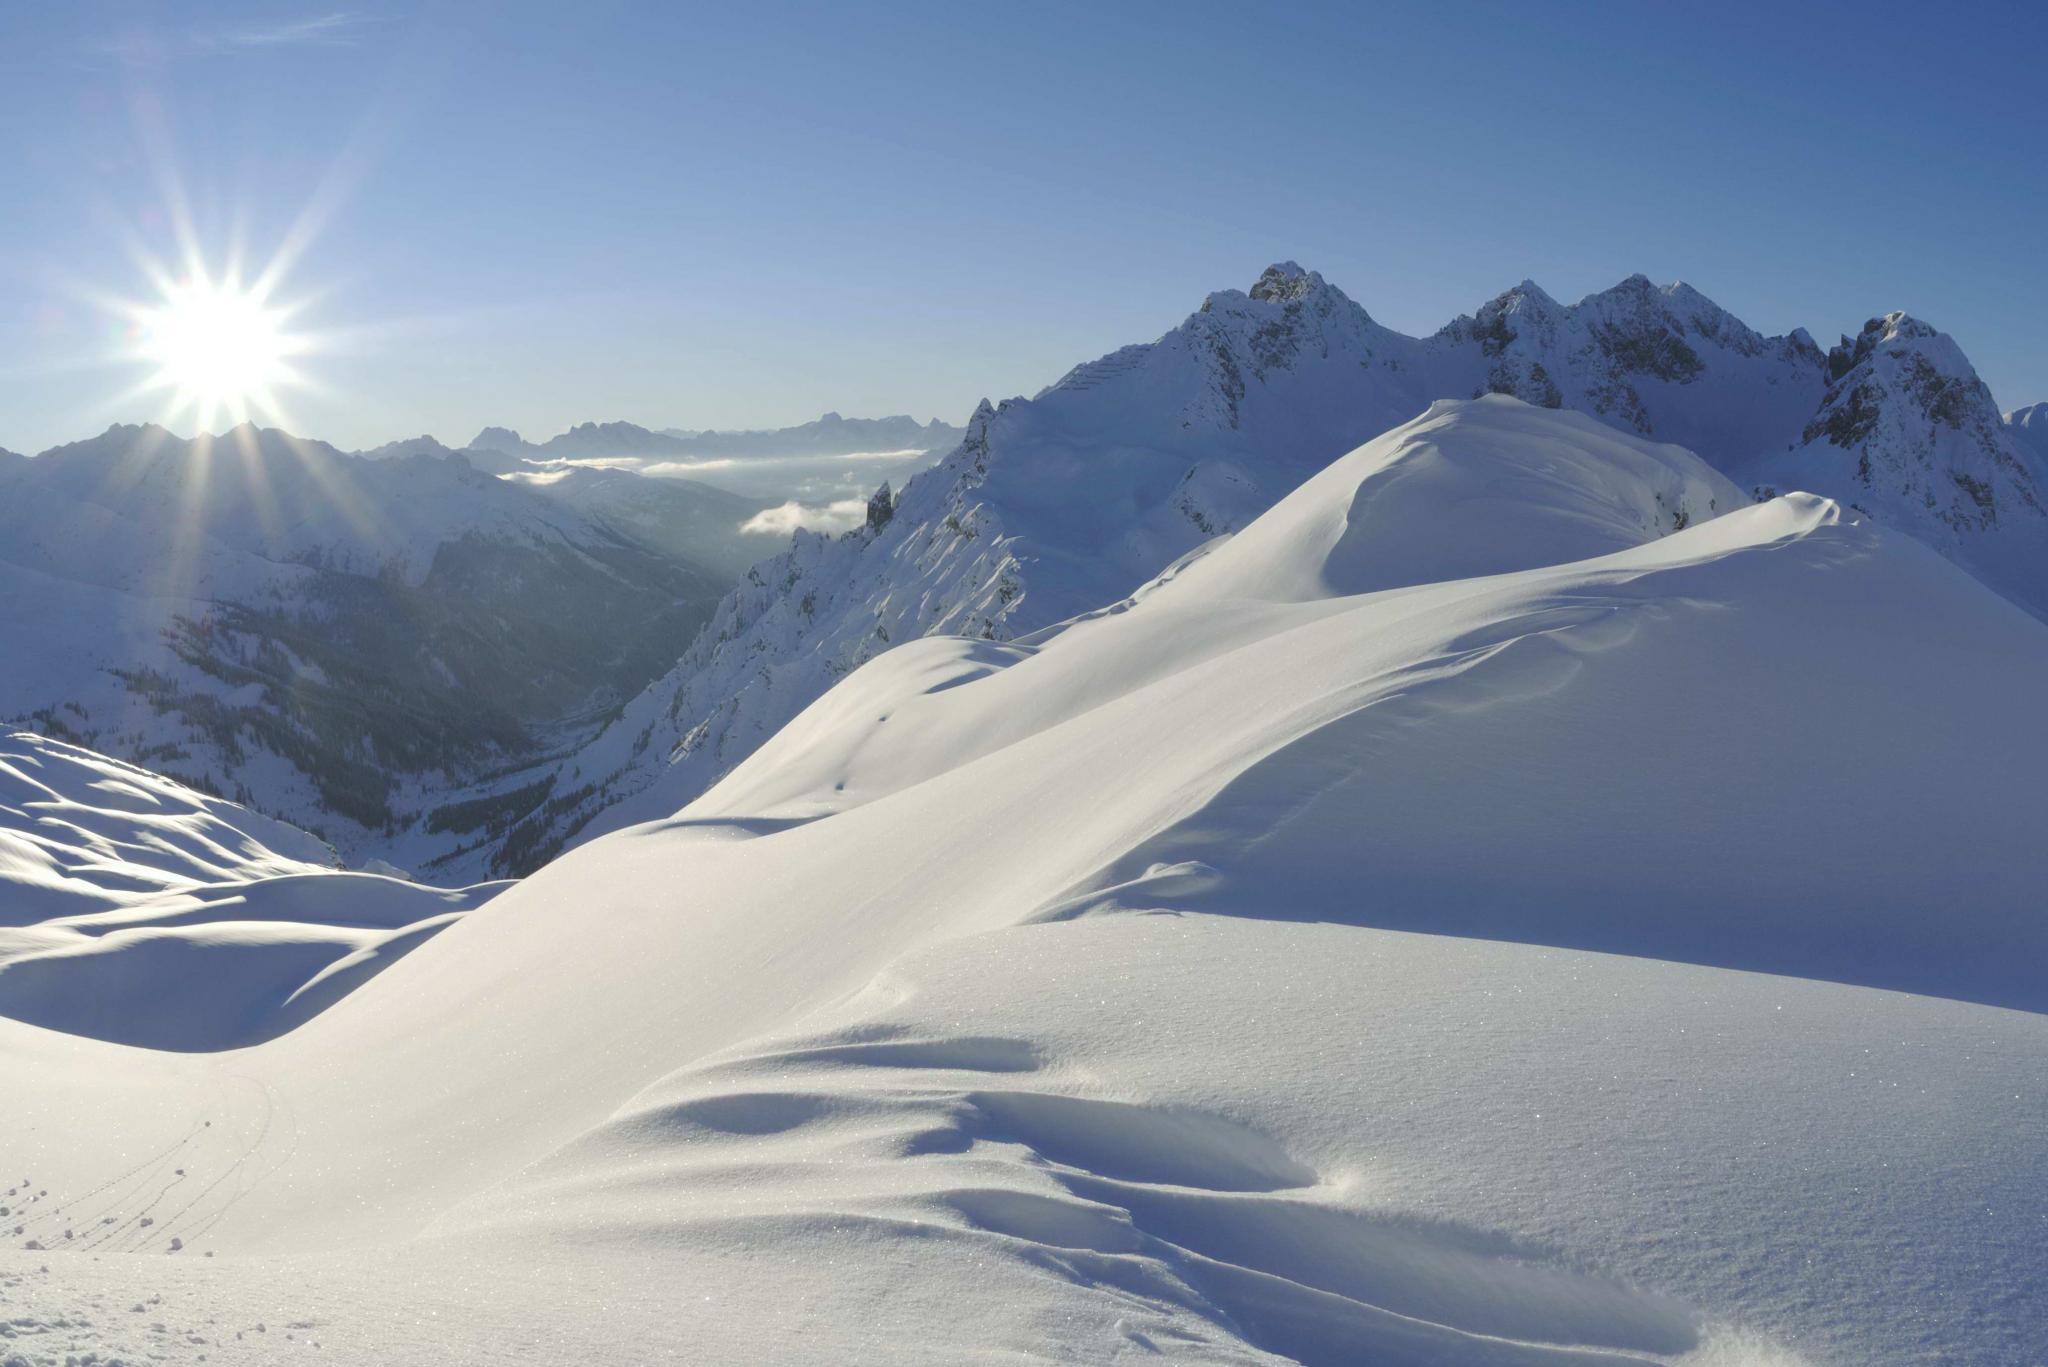 Sonne hinter den Bergen Region Zürs Lech